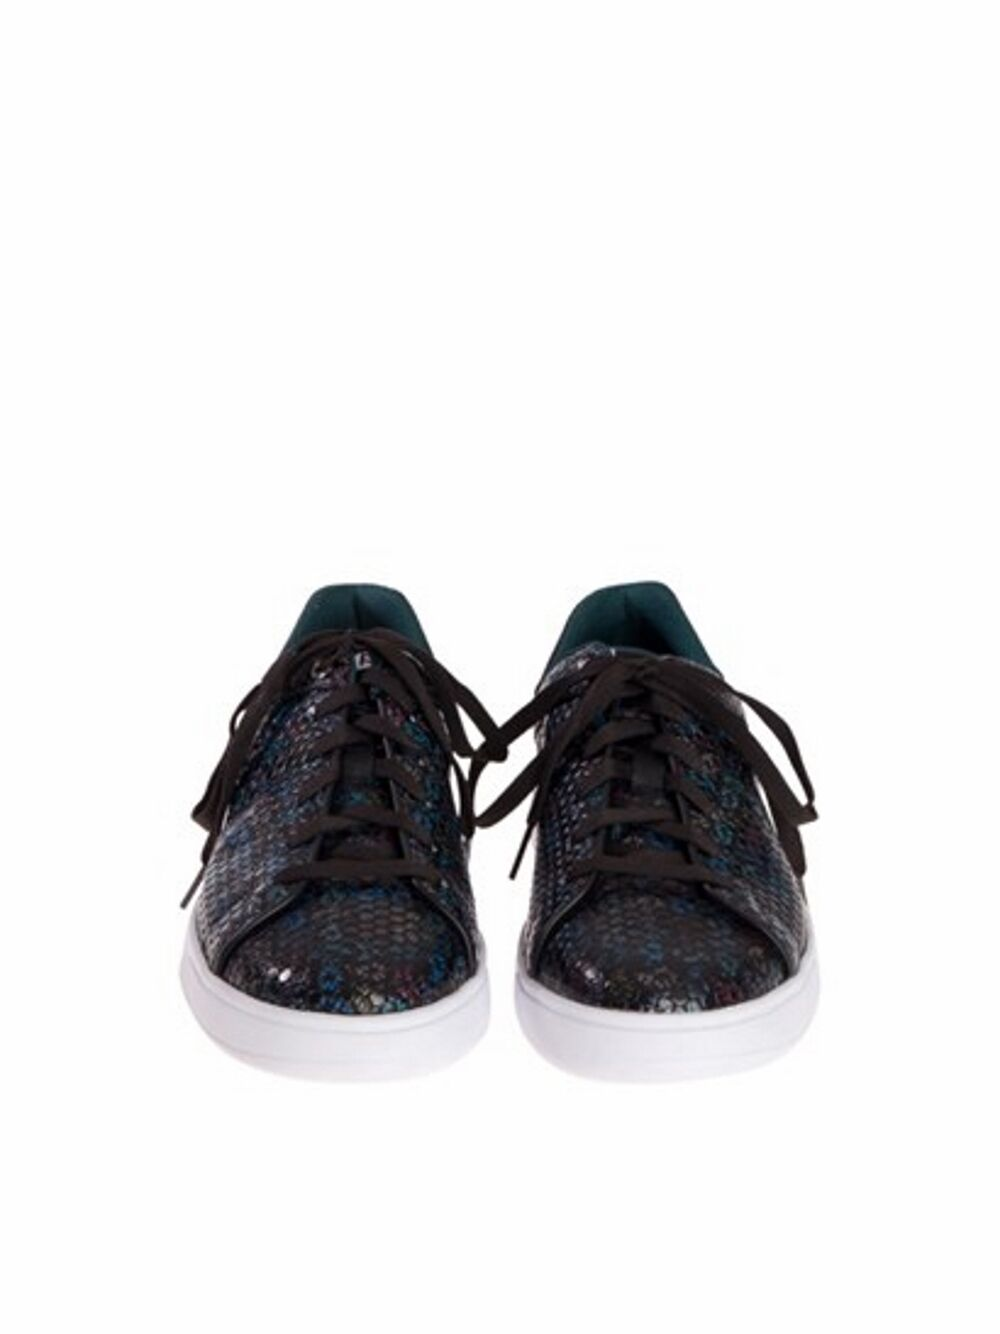 Paul Smith Sneakers Print Print Print serge trainers, Serge print trainers sneakers d57d63